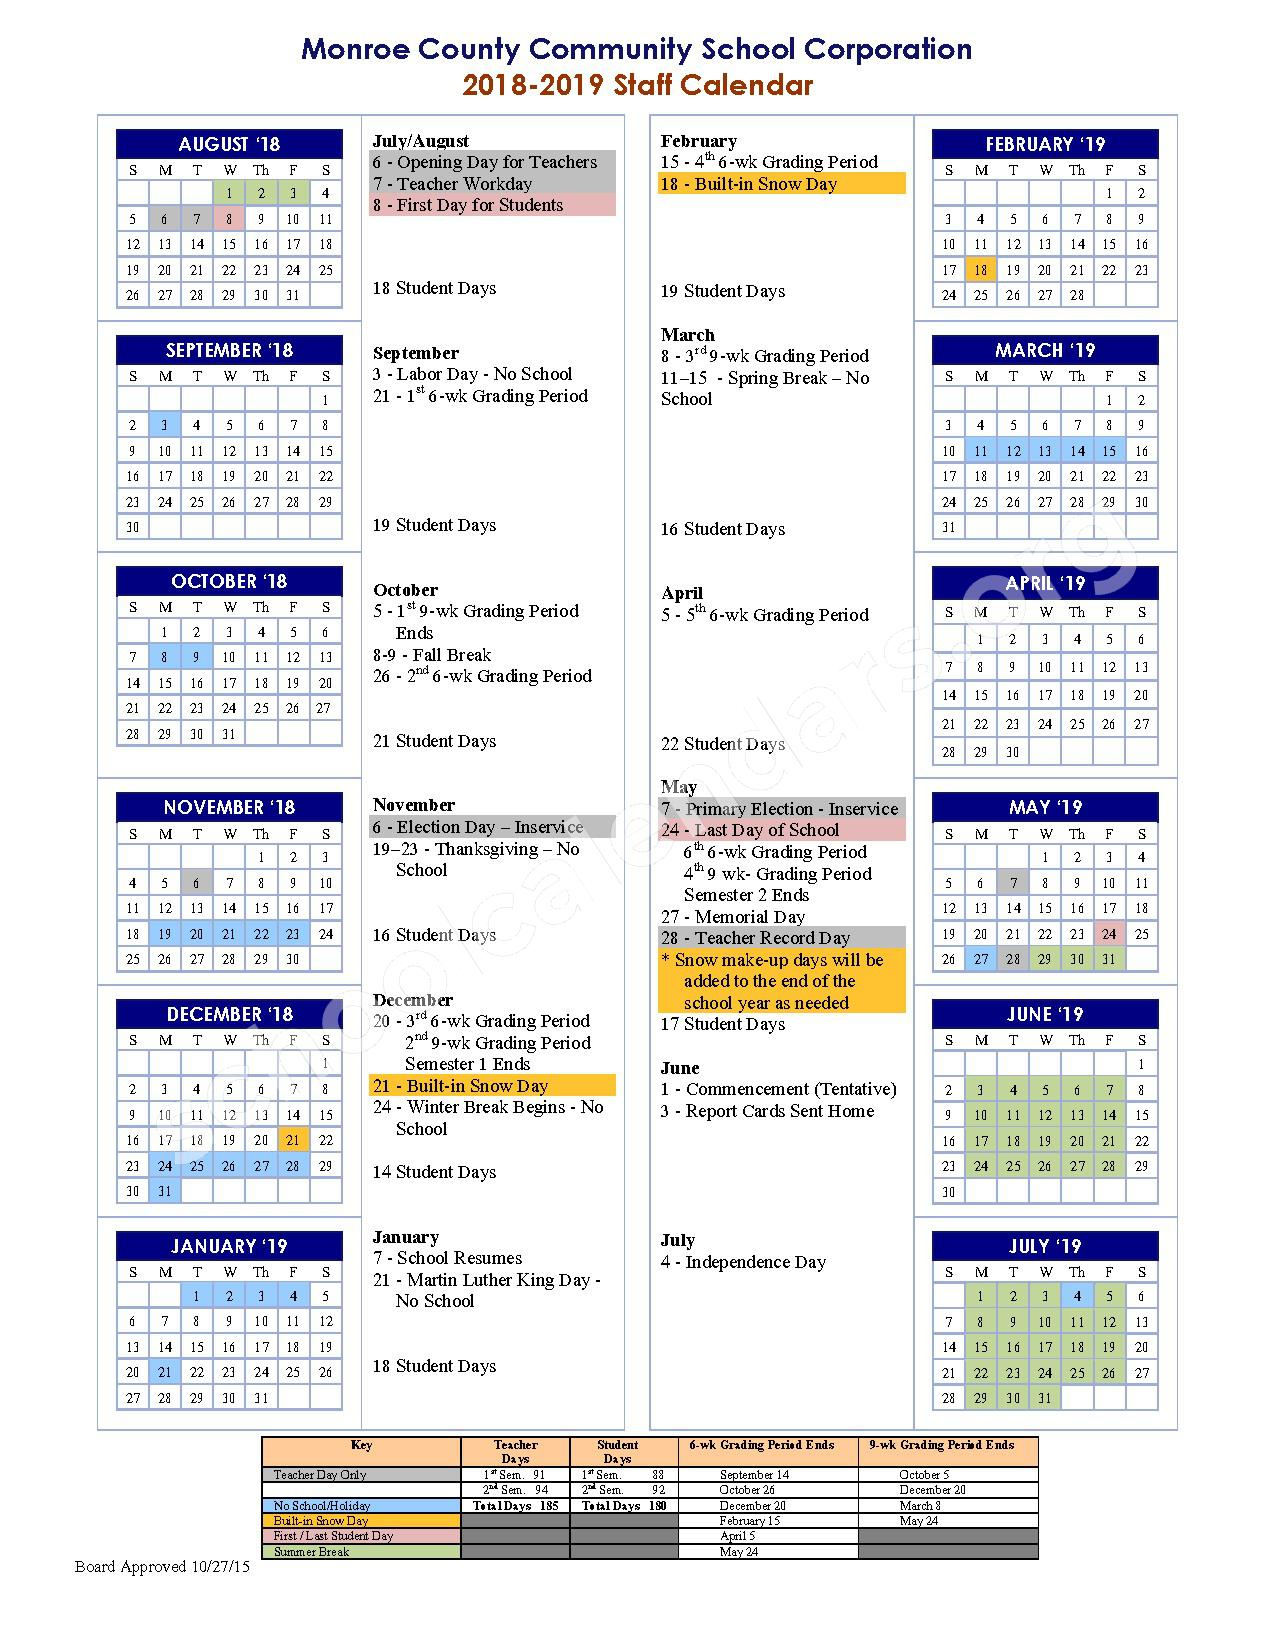 2018 - 2019 School Calendar – Monroe County Community School Corporation – page 1